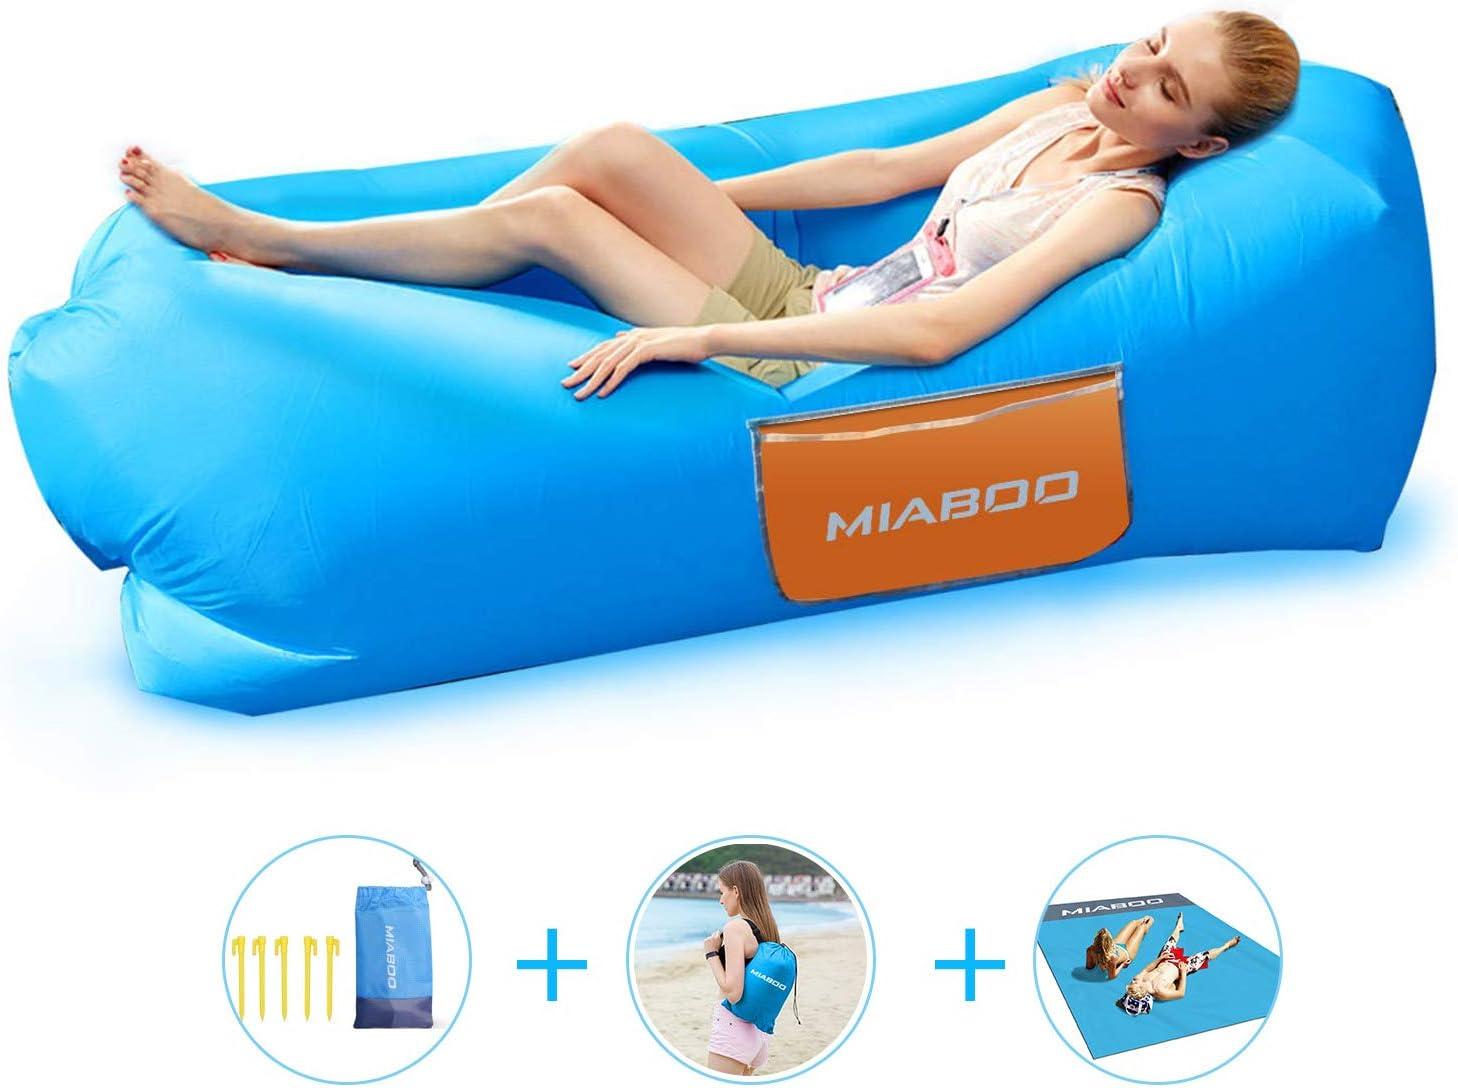 Amazon.com : MIABOO Inflatable Lounger Air Sofa, Waterproof ...